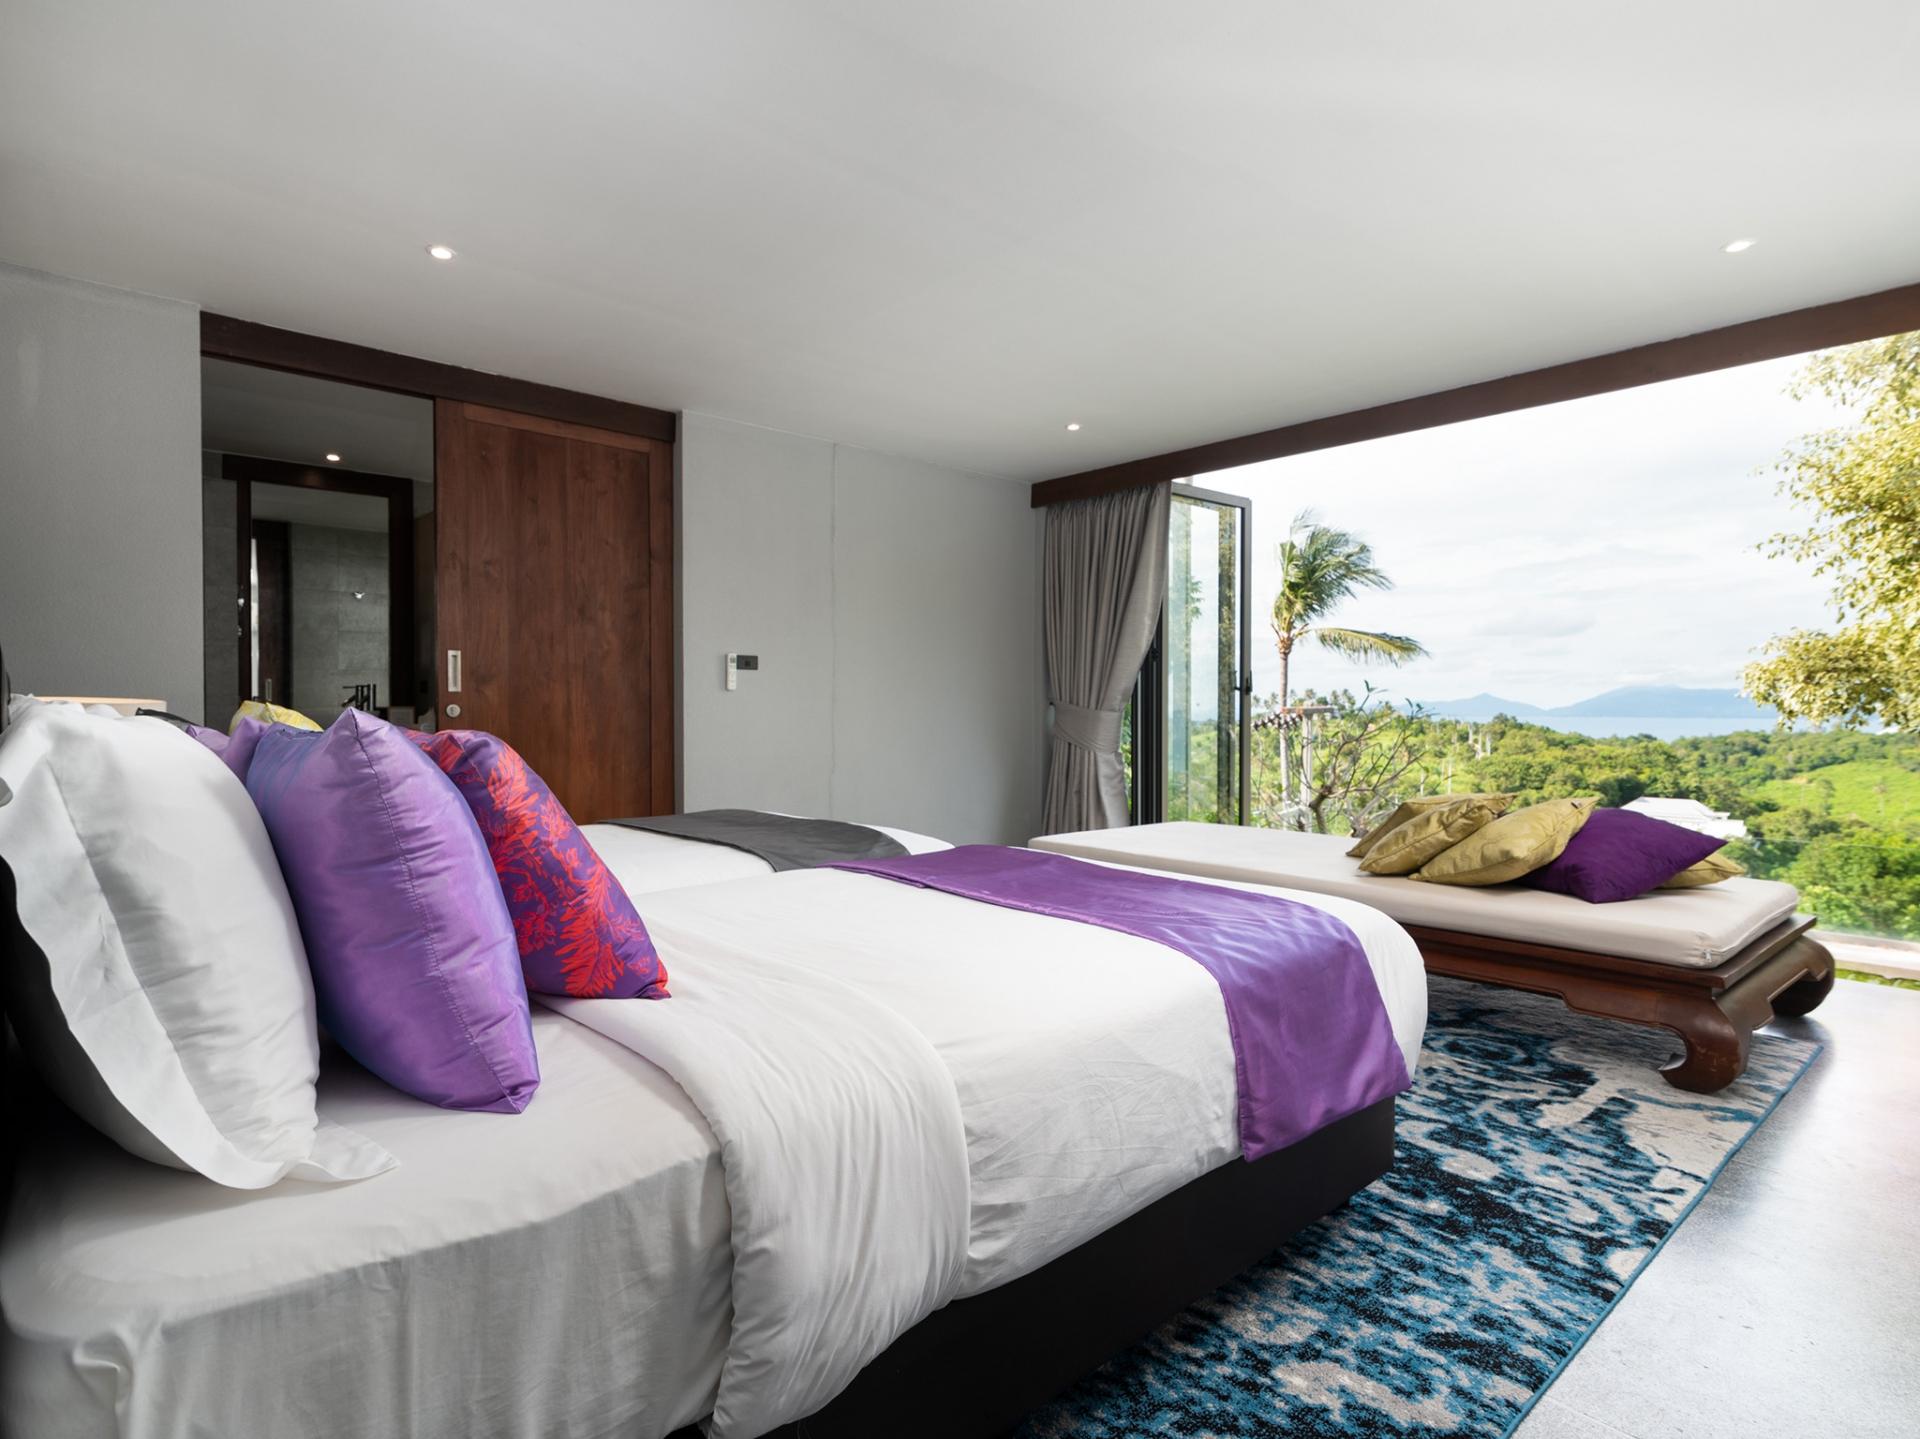 Breathtaking Family Villa-021 Villa Suralai - Twin deluxe bedroom.jpg